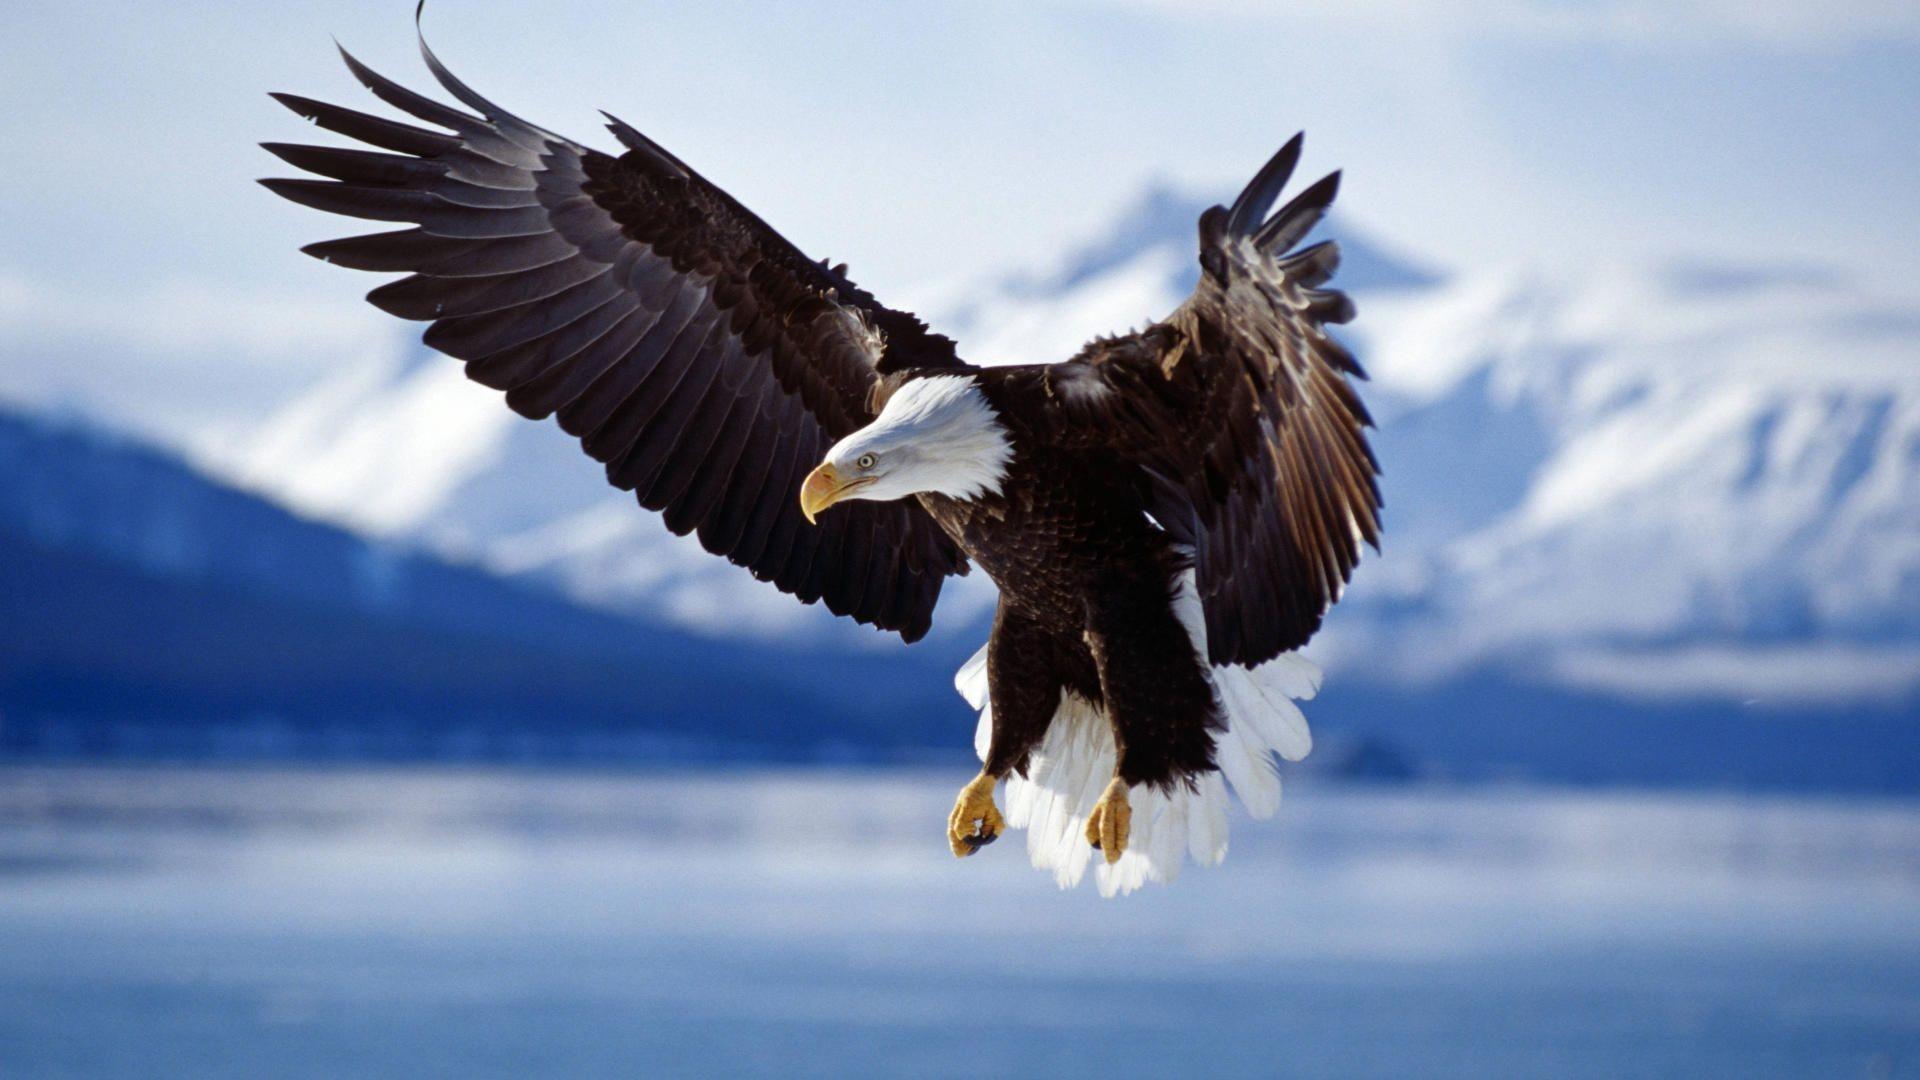 Bald Eagle Alaska Desktop High Quality WallpapersWallpaper Desktop 1920x1080